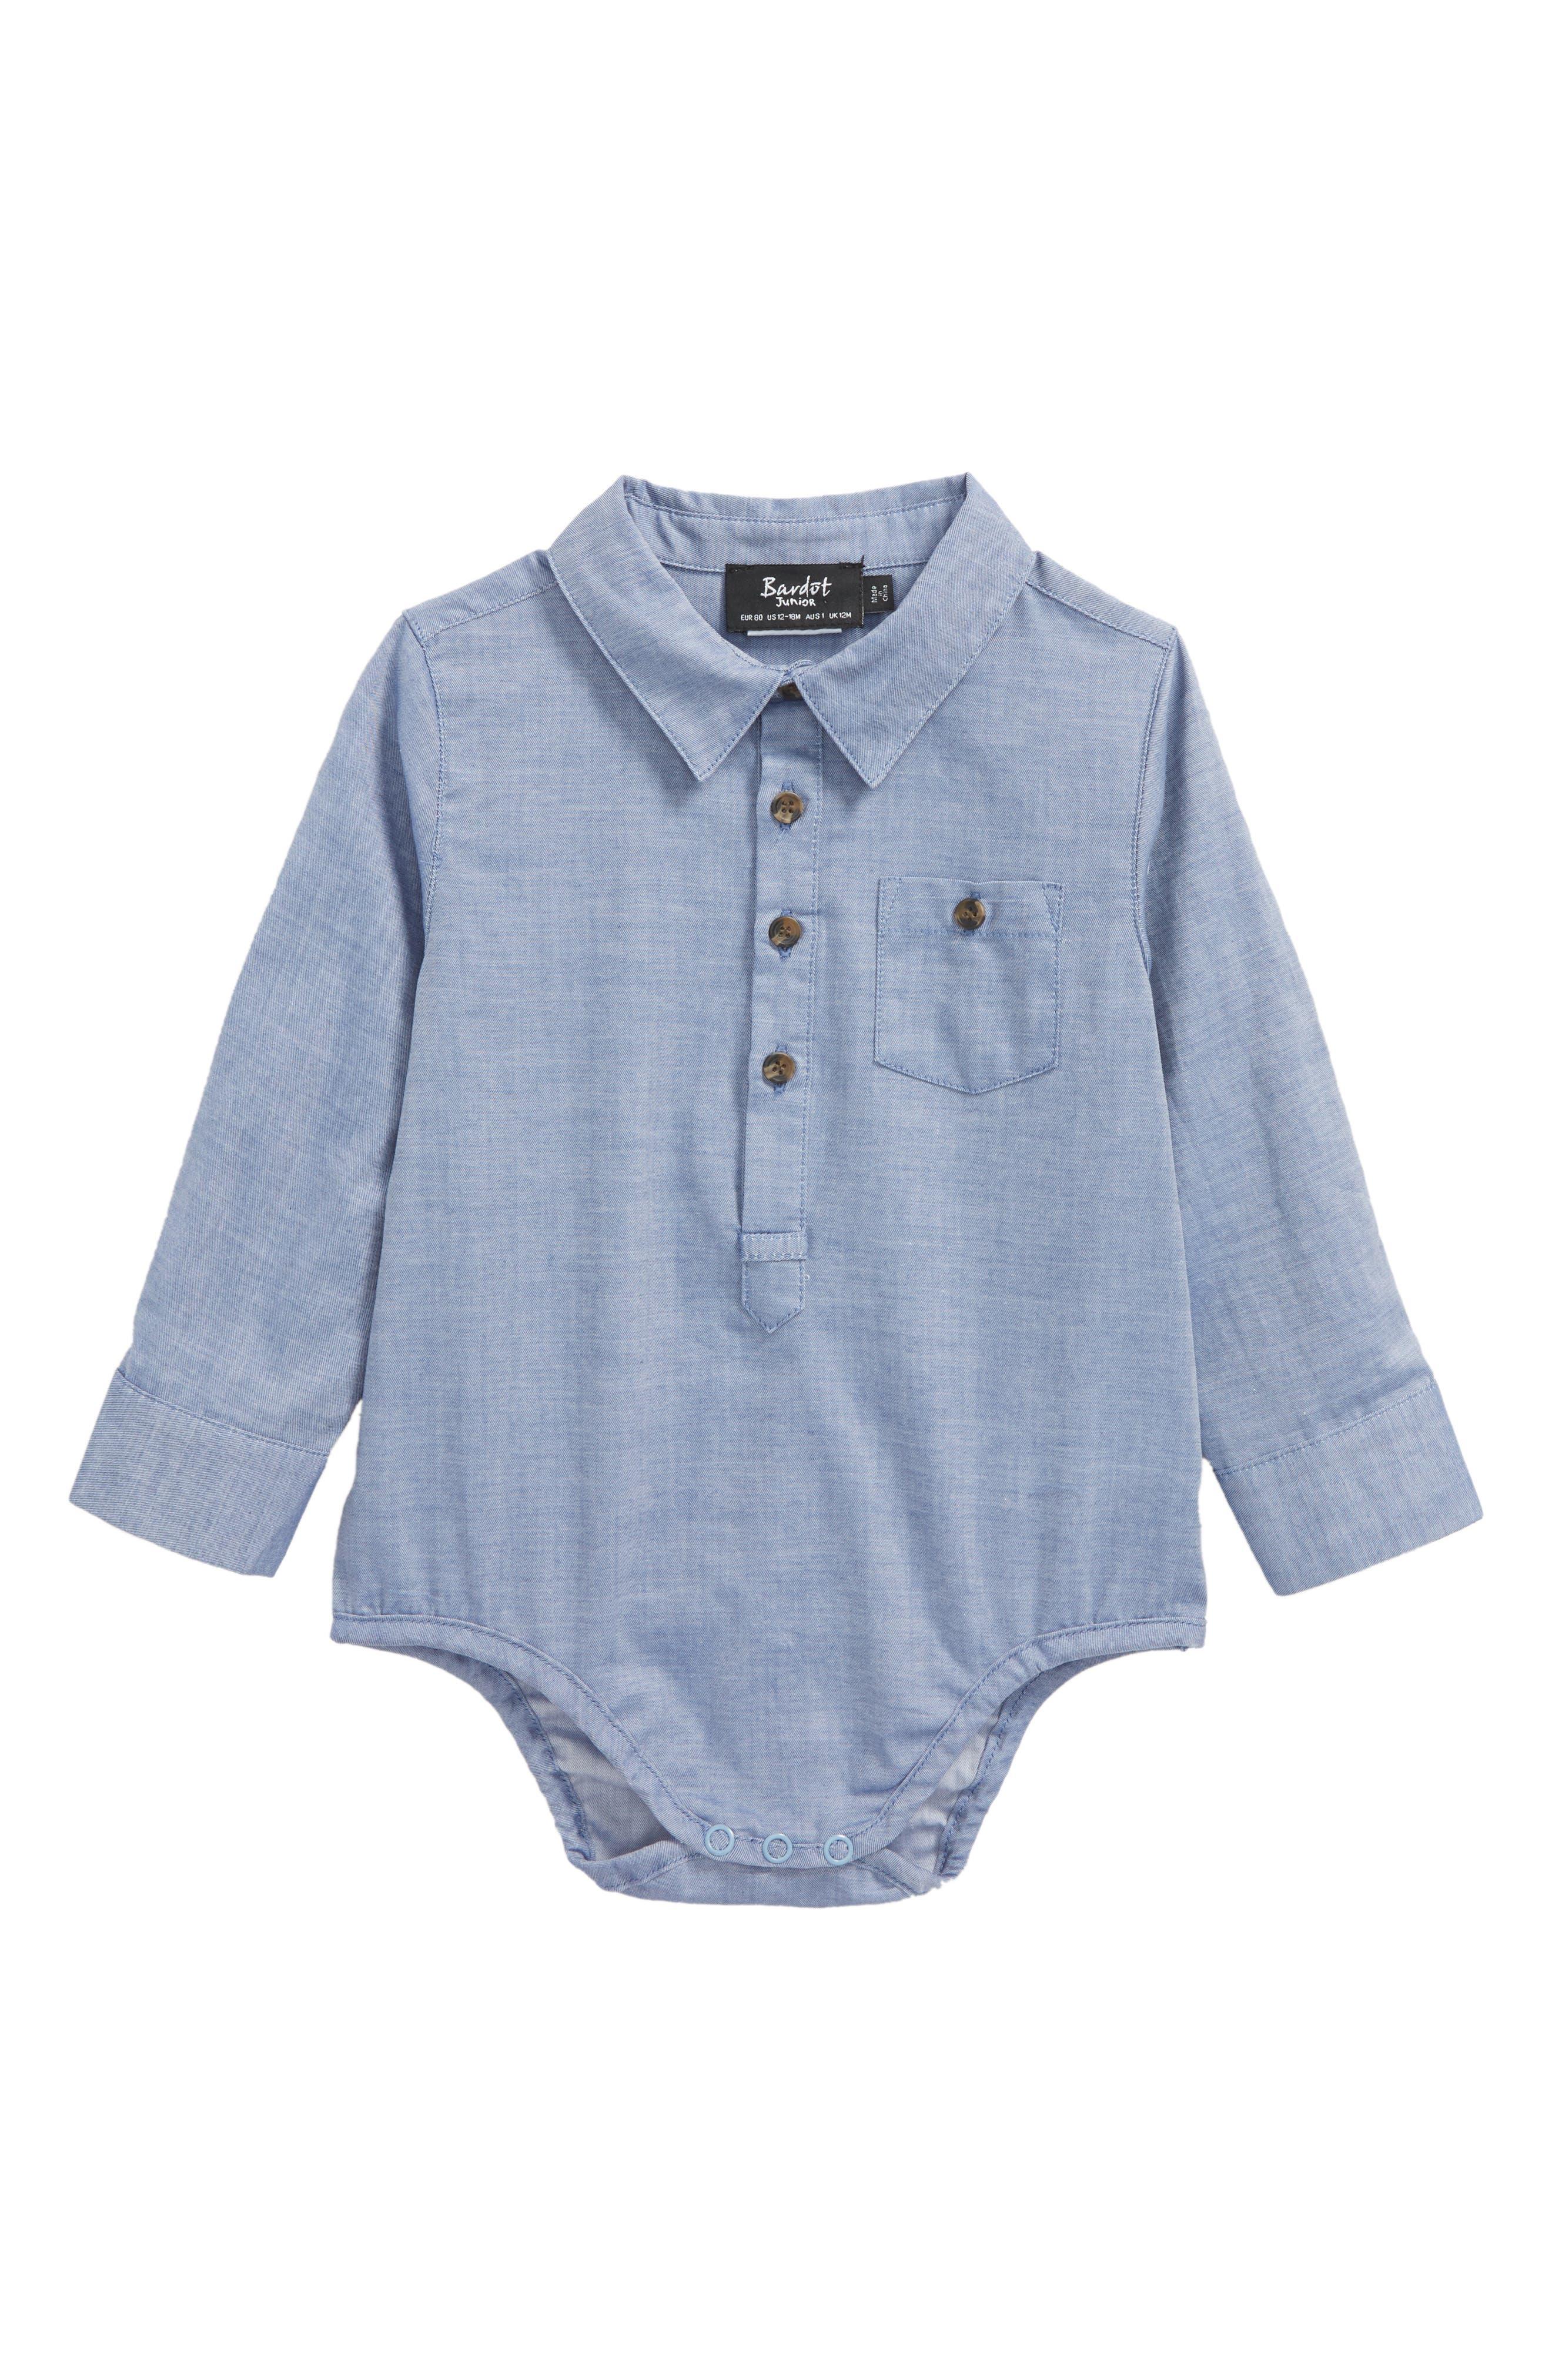 Alternate Image 1 Selected - Bardot Junior Grow Chambray Pocket Bodysuit (Baby Boys)